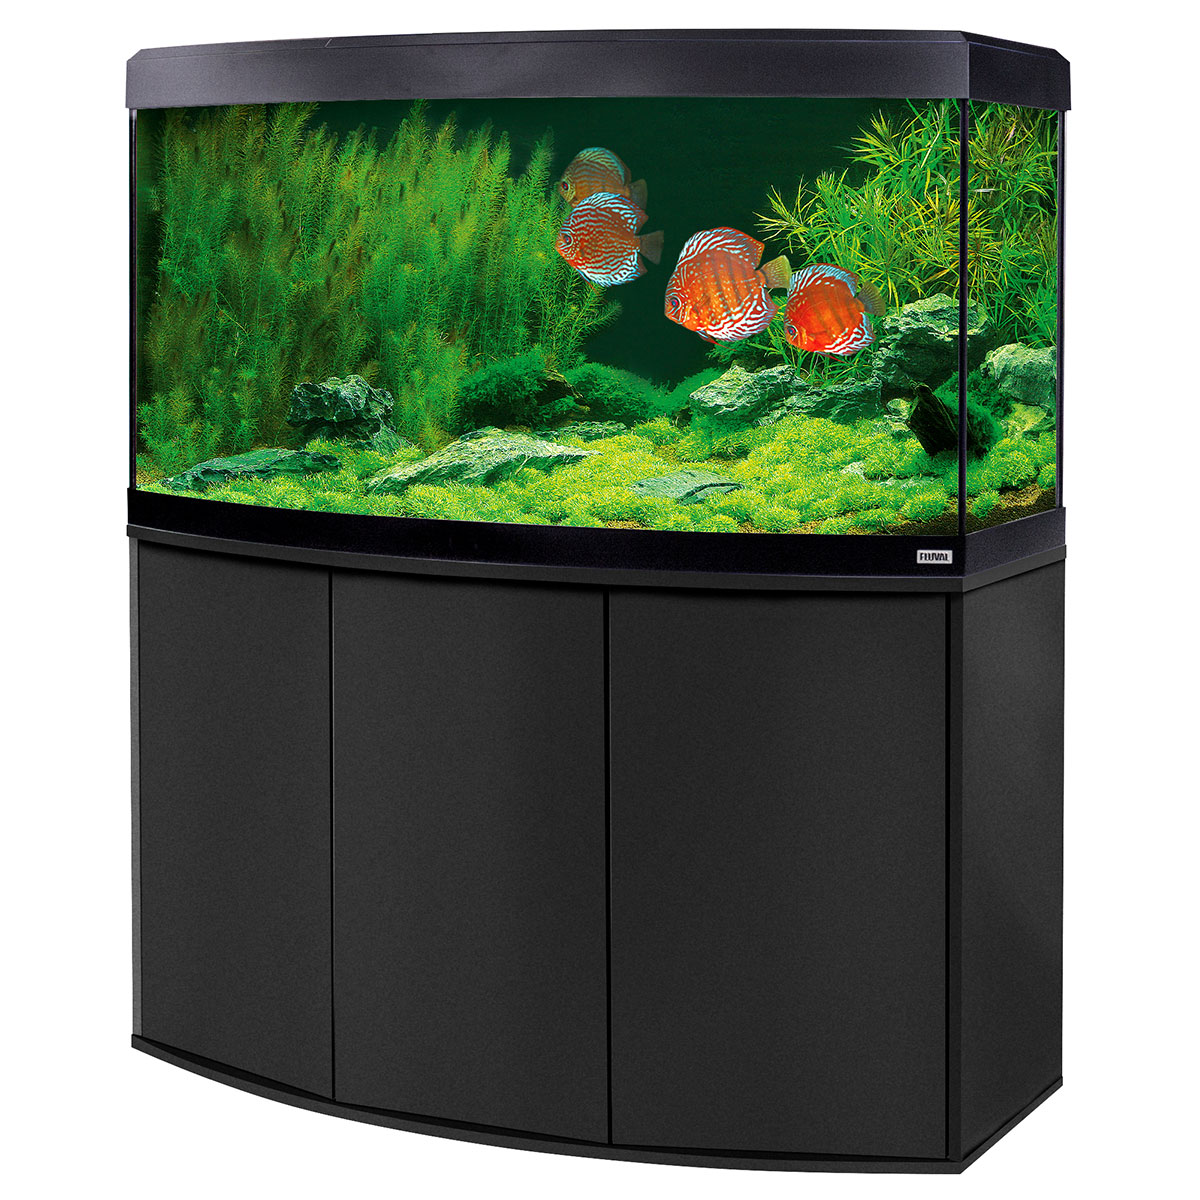 fluval panoramaaquarium mit led beleuchtung vicenza 260. Black Bedroom Furniture Sets. Home Design Ideas